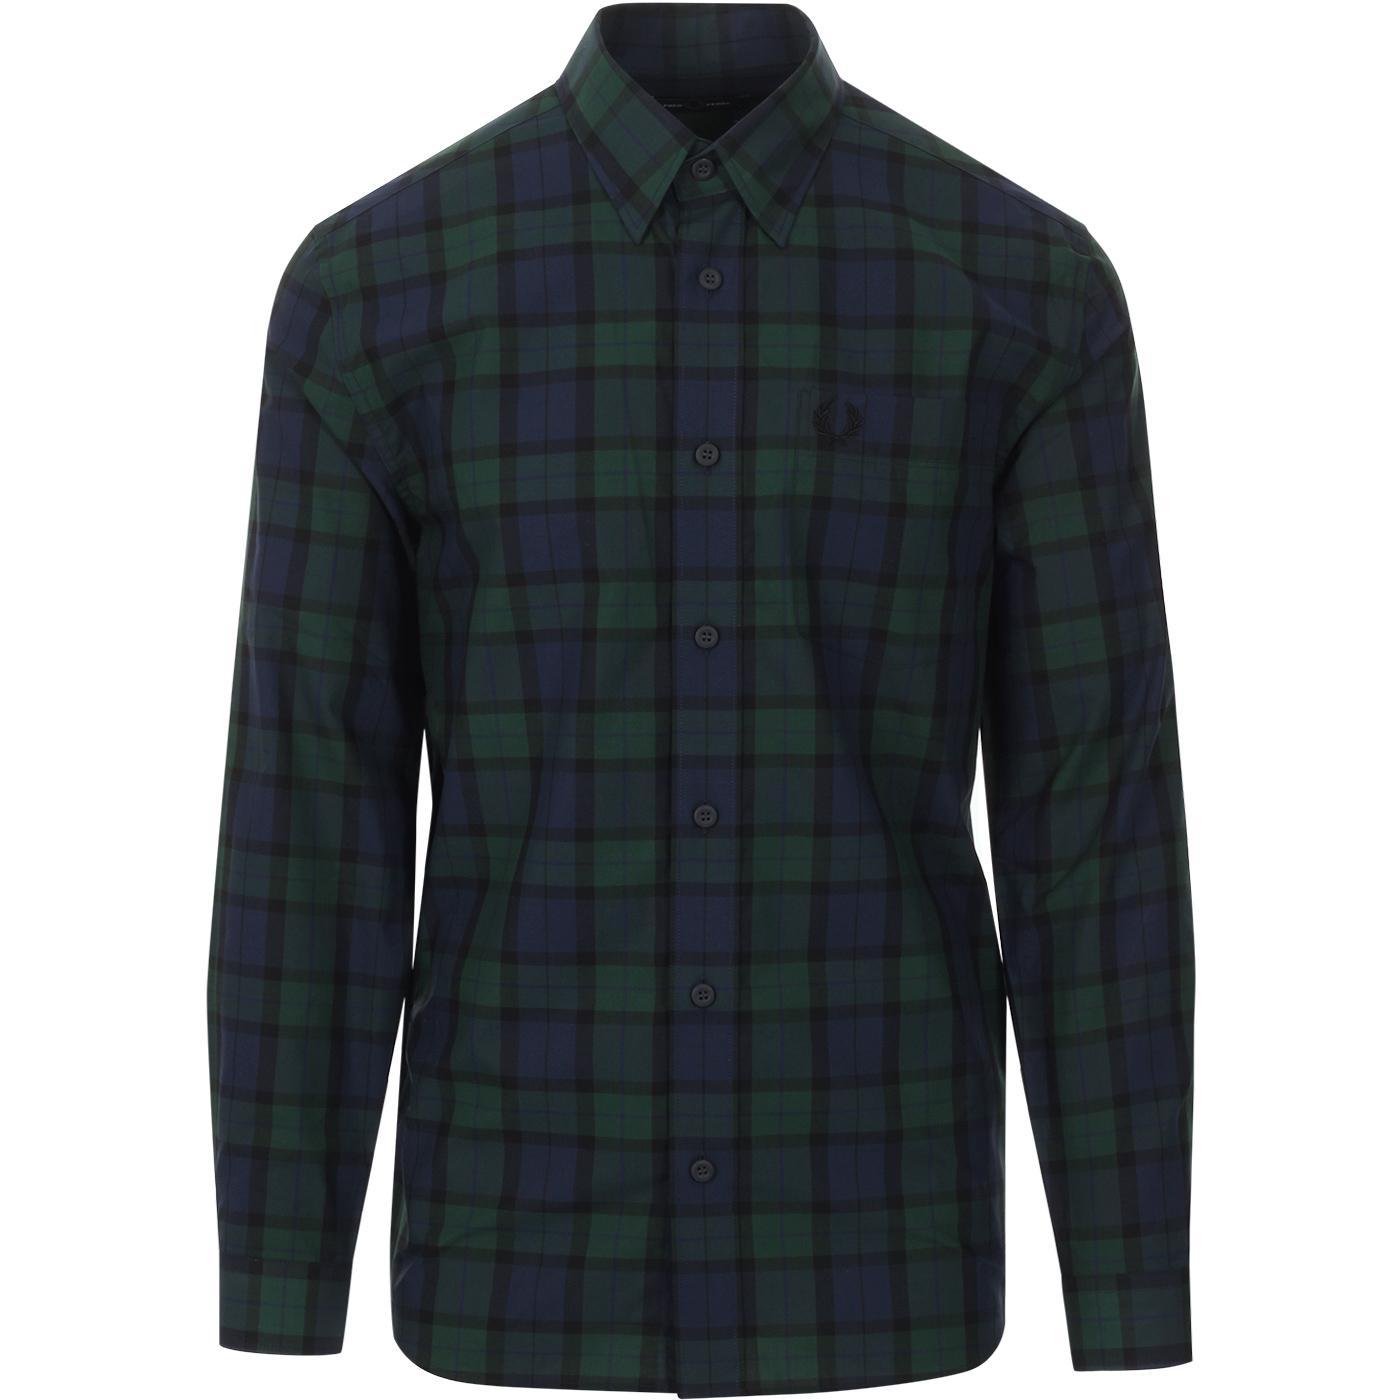 FRED PERRY Button Through Retro Green Tartan Shirt